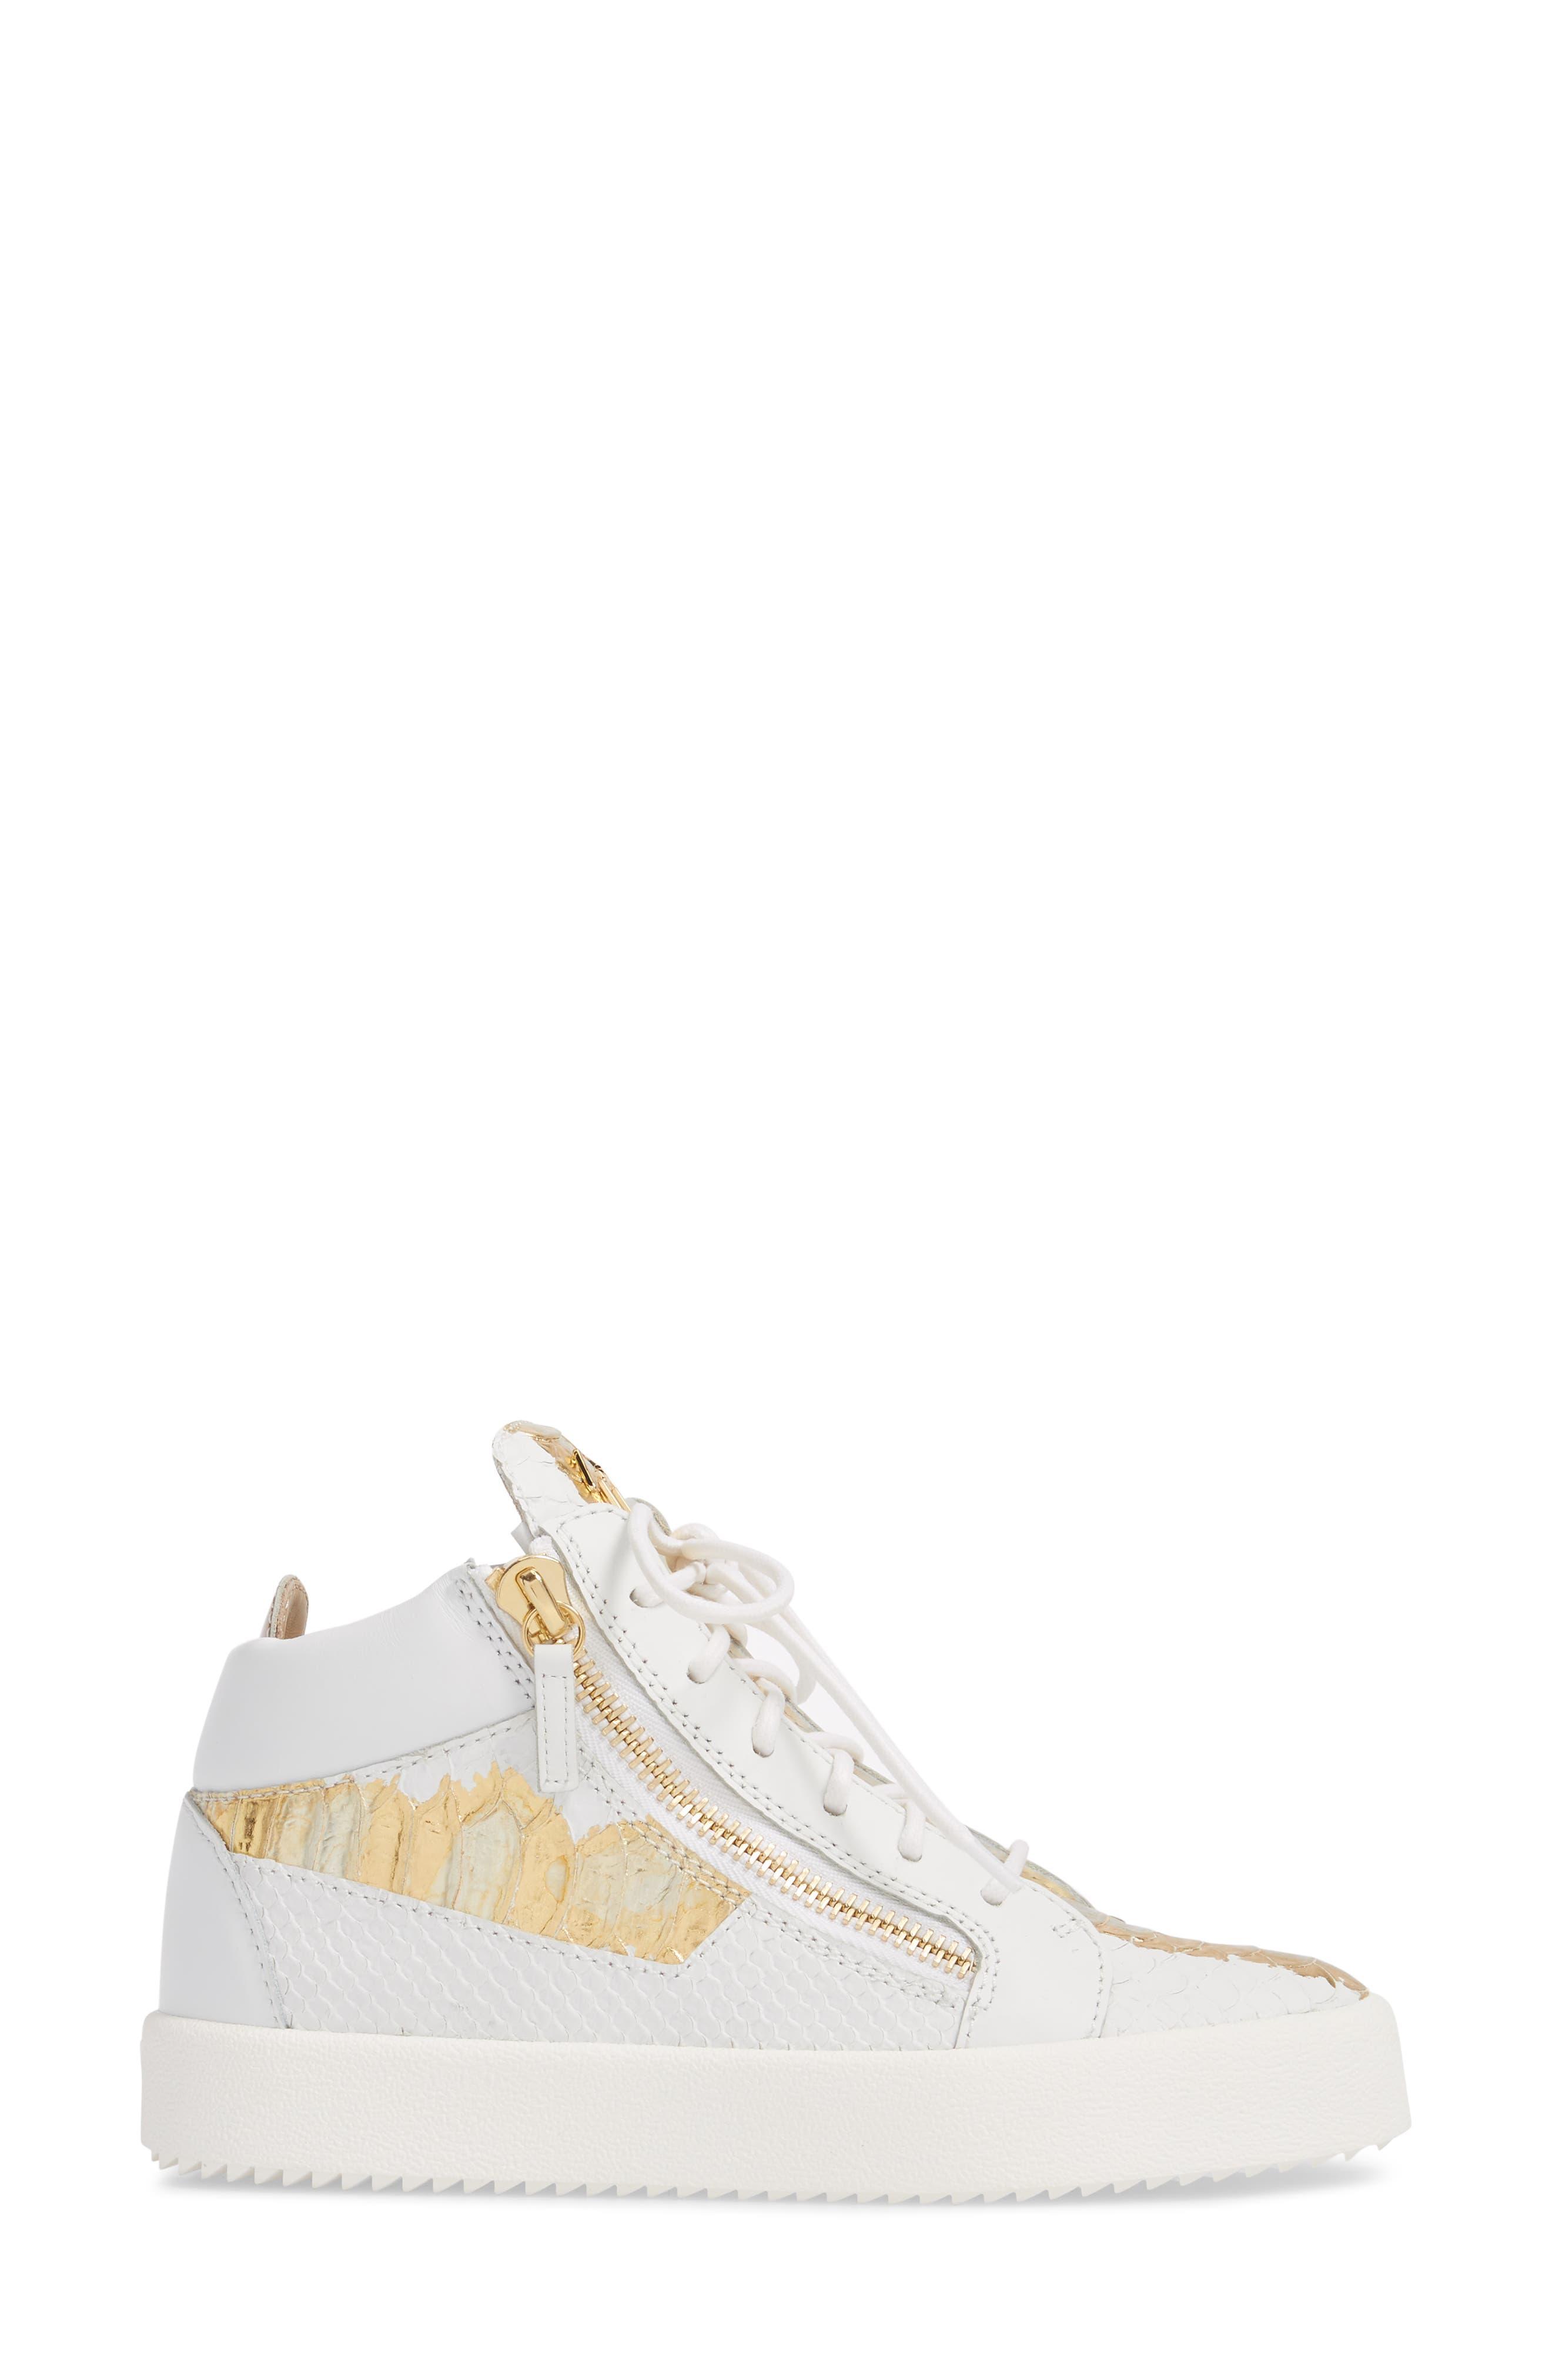 GIUSEPPE ZANOTTI, May London Mid Top Sneaker, Alternate thumbnail 3, color, WHITE/NEON YELLOW